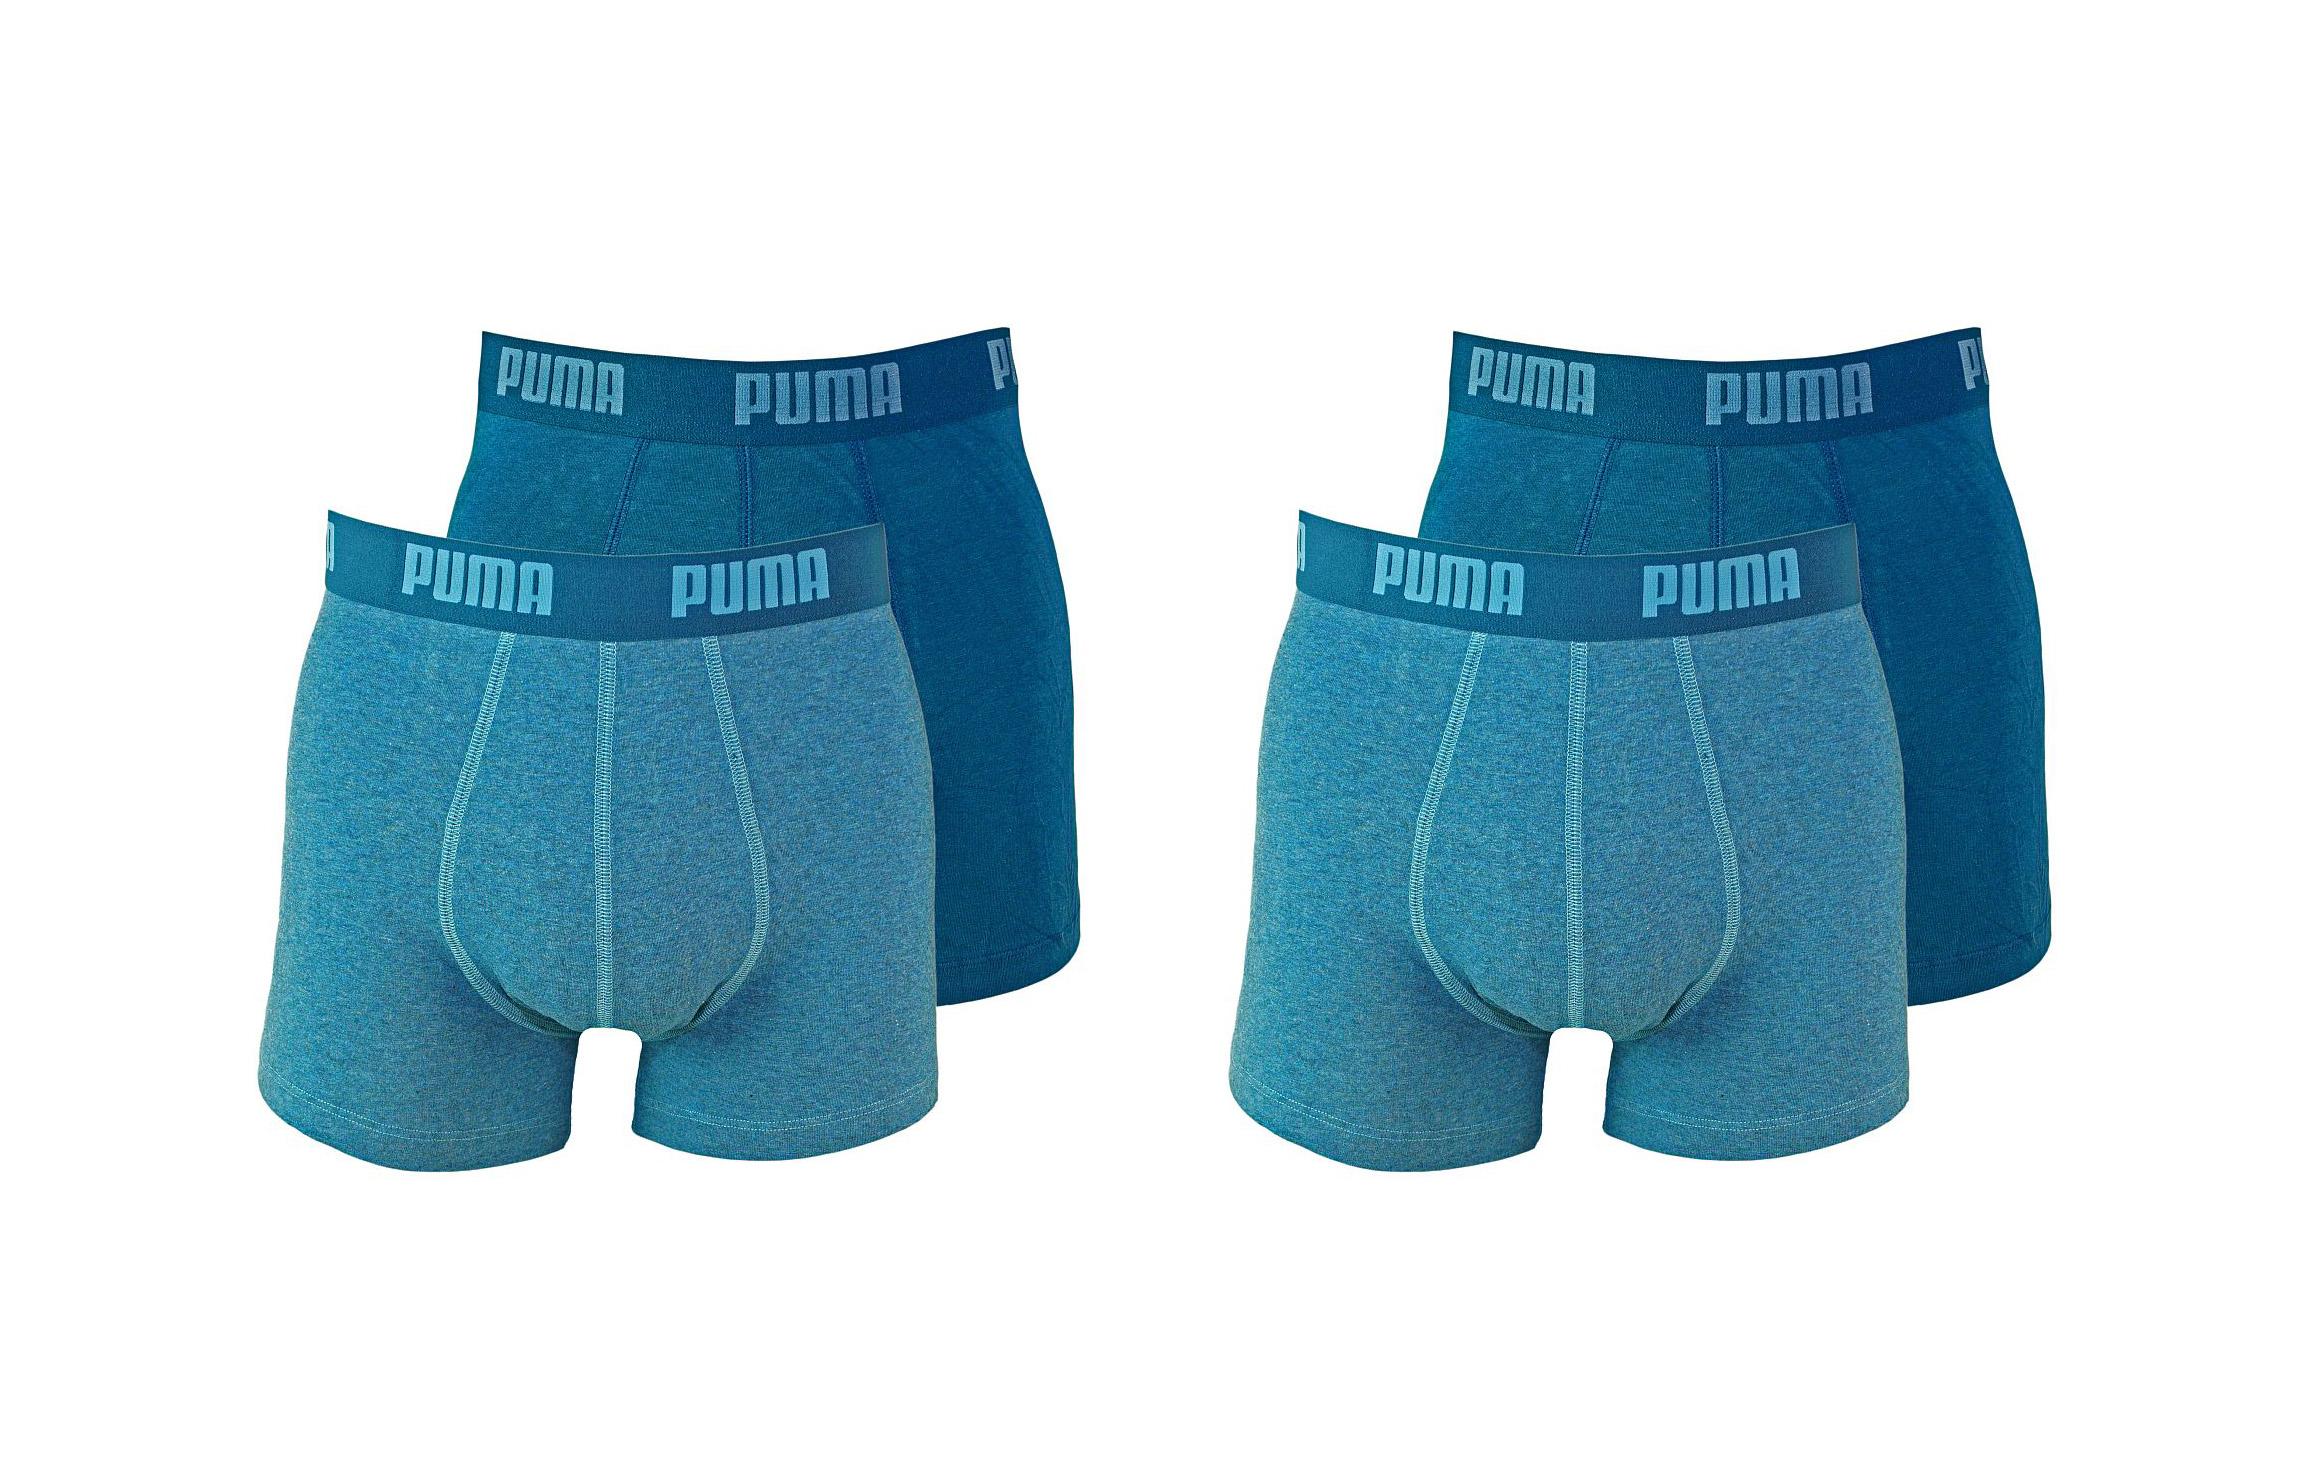 PUMA Shorts Unterhosen 2 x 2er Pack Boxer 521015001 162 020 denim SF17-PMS2